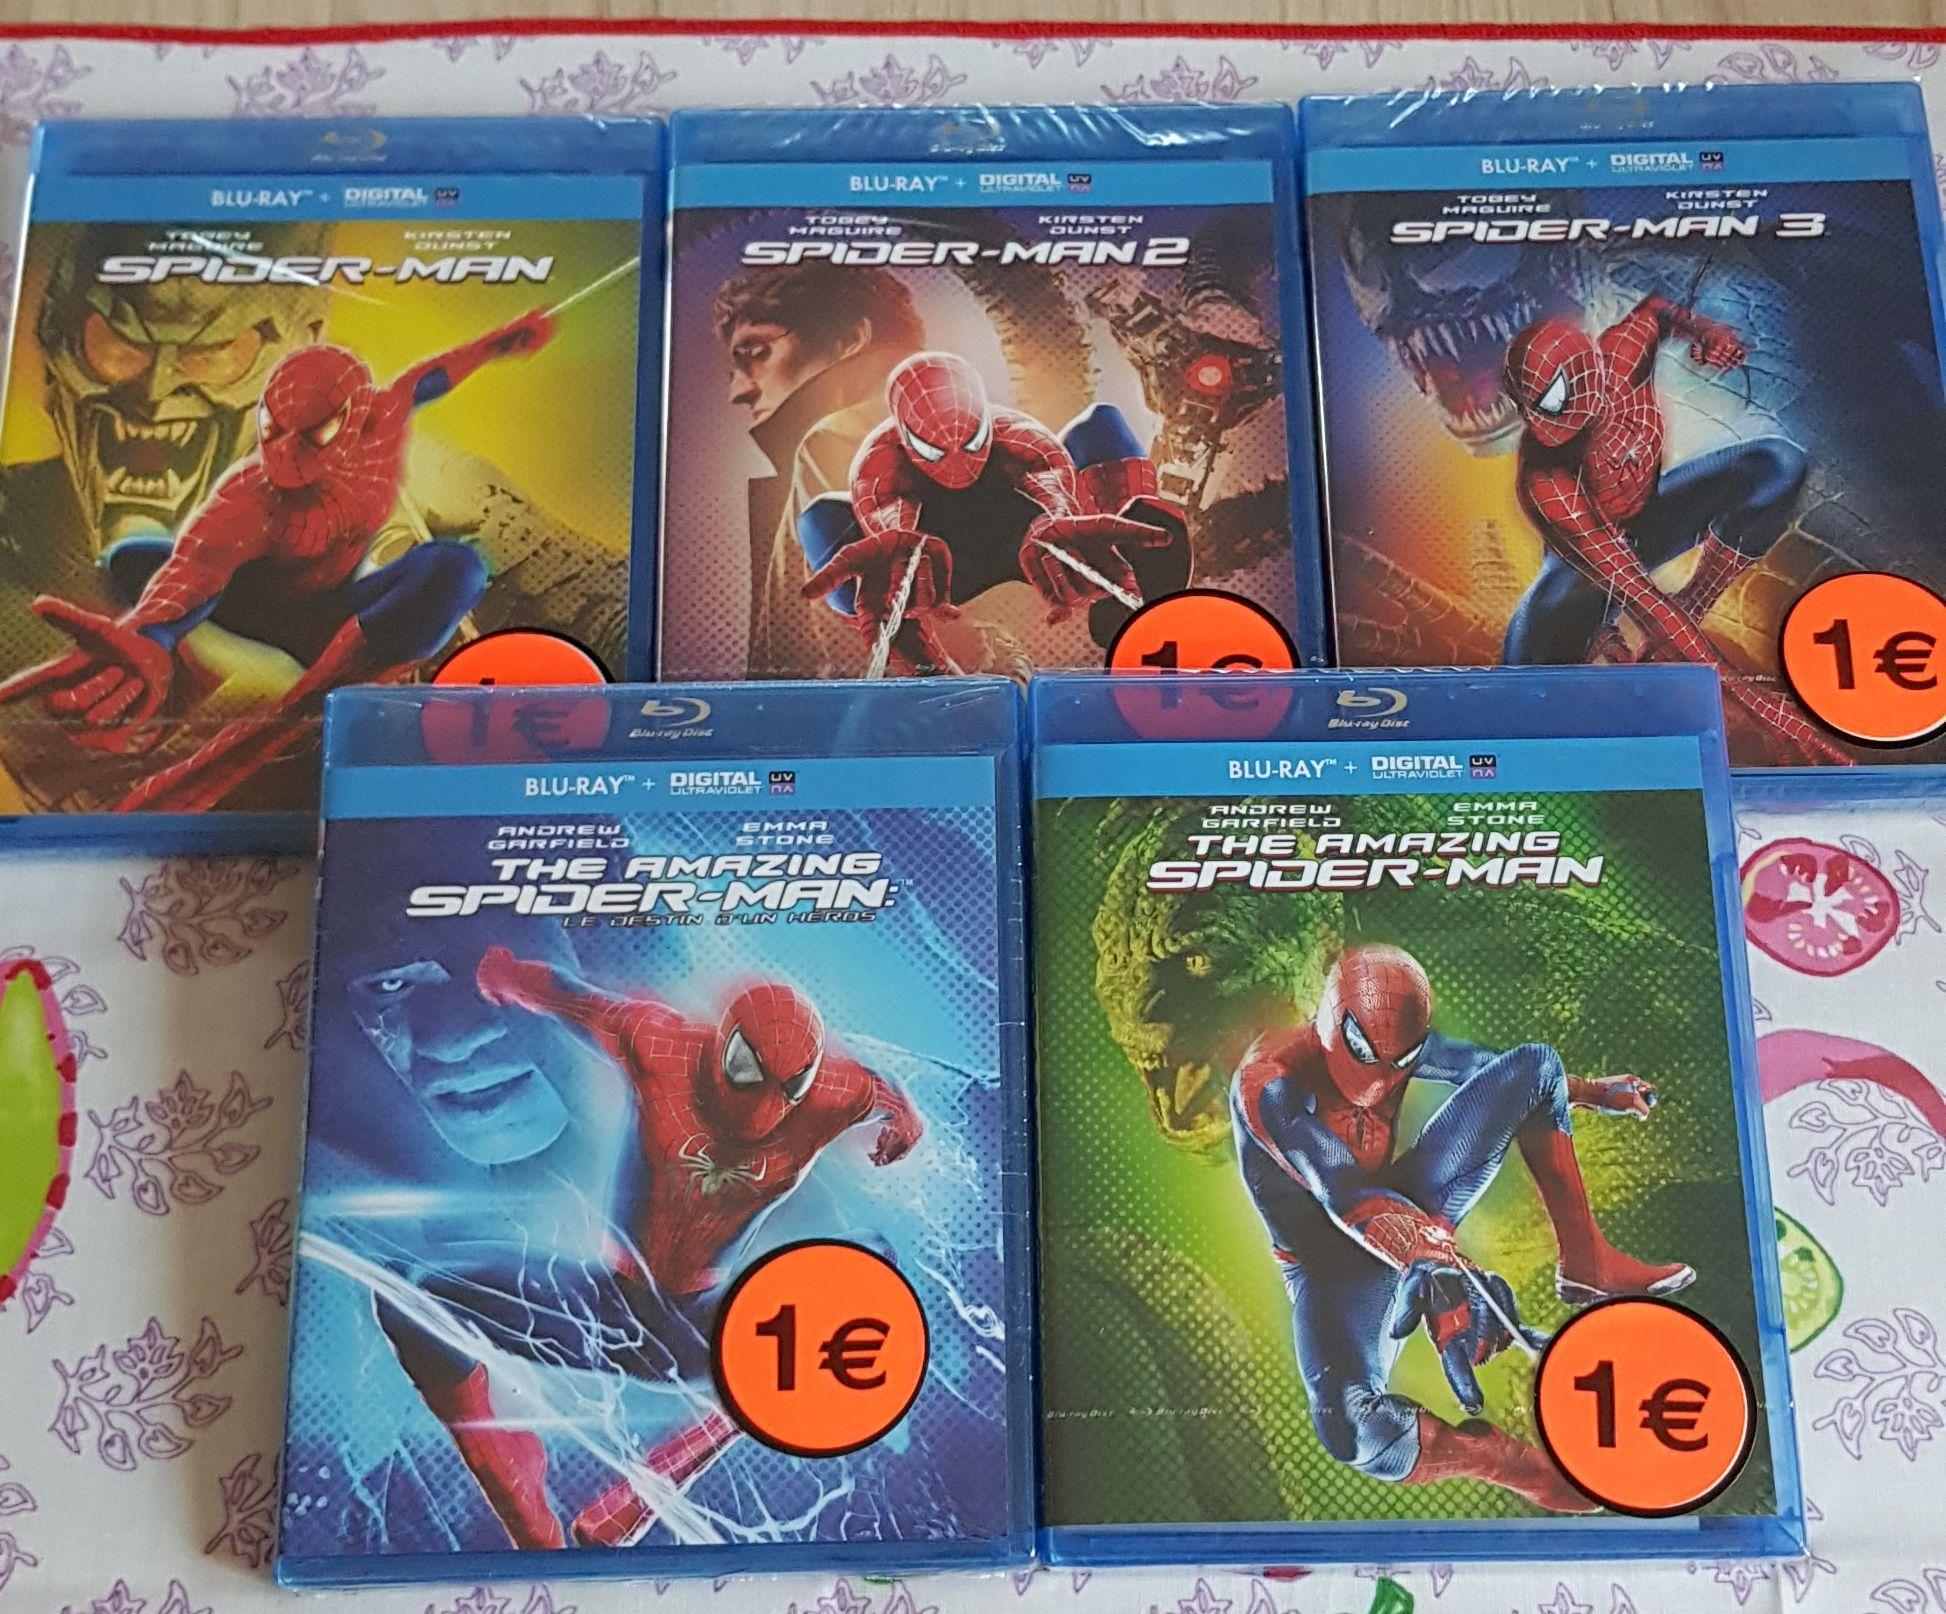 Sélection de Blu-ray Spider-man à 1€ - Schweighouse-sur-Moder (67)